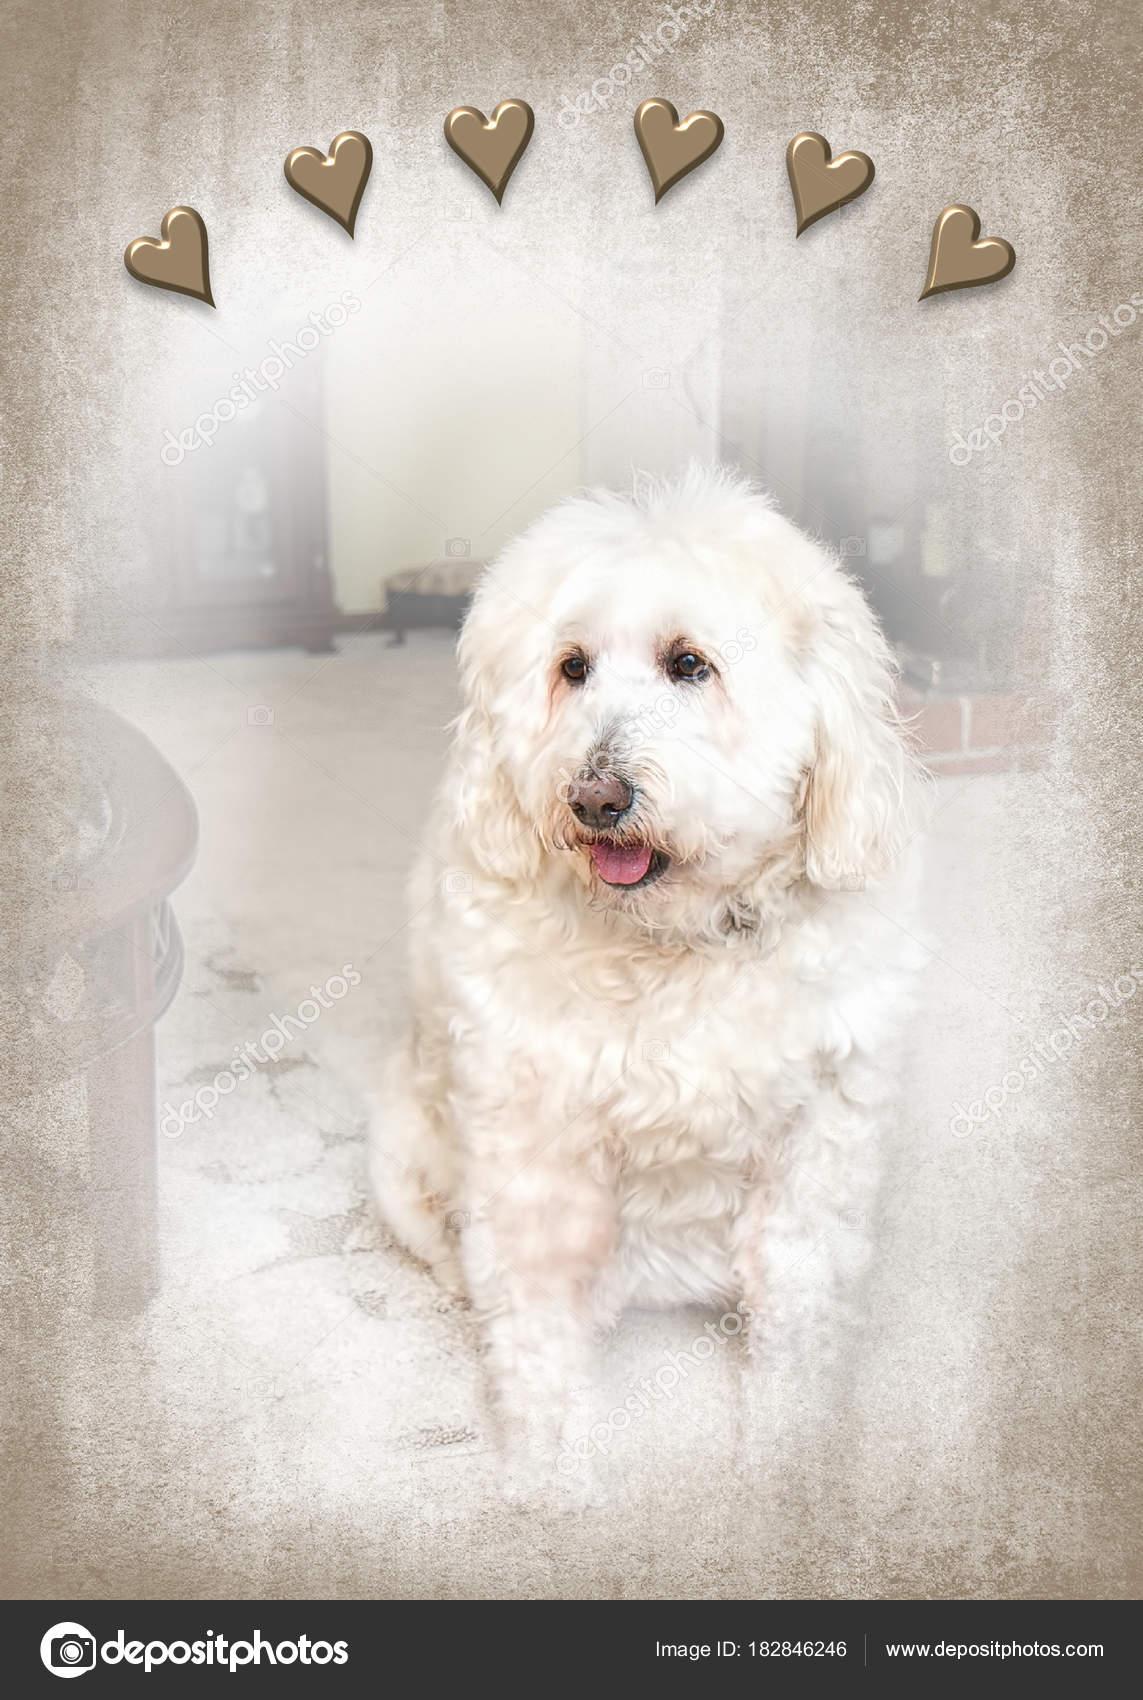 White Fluffy Golden Doodle Dog Sitting Living Room